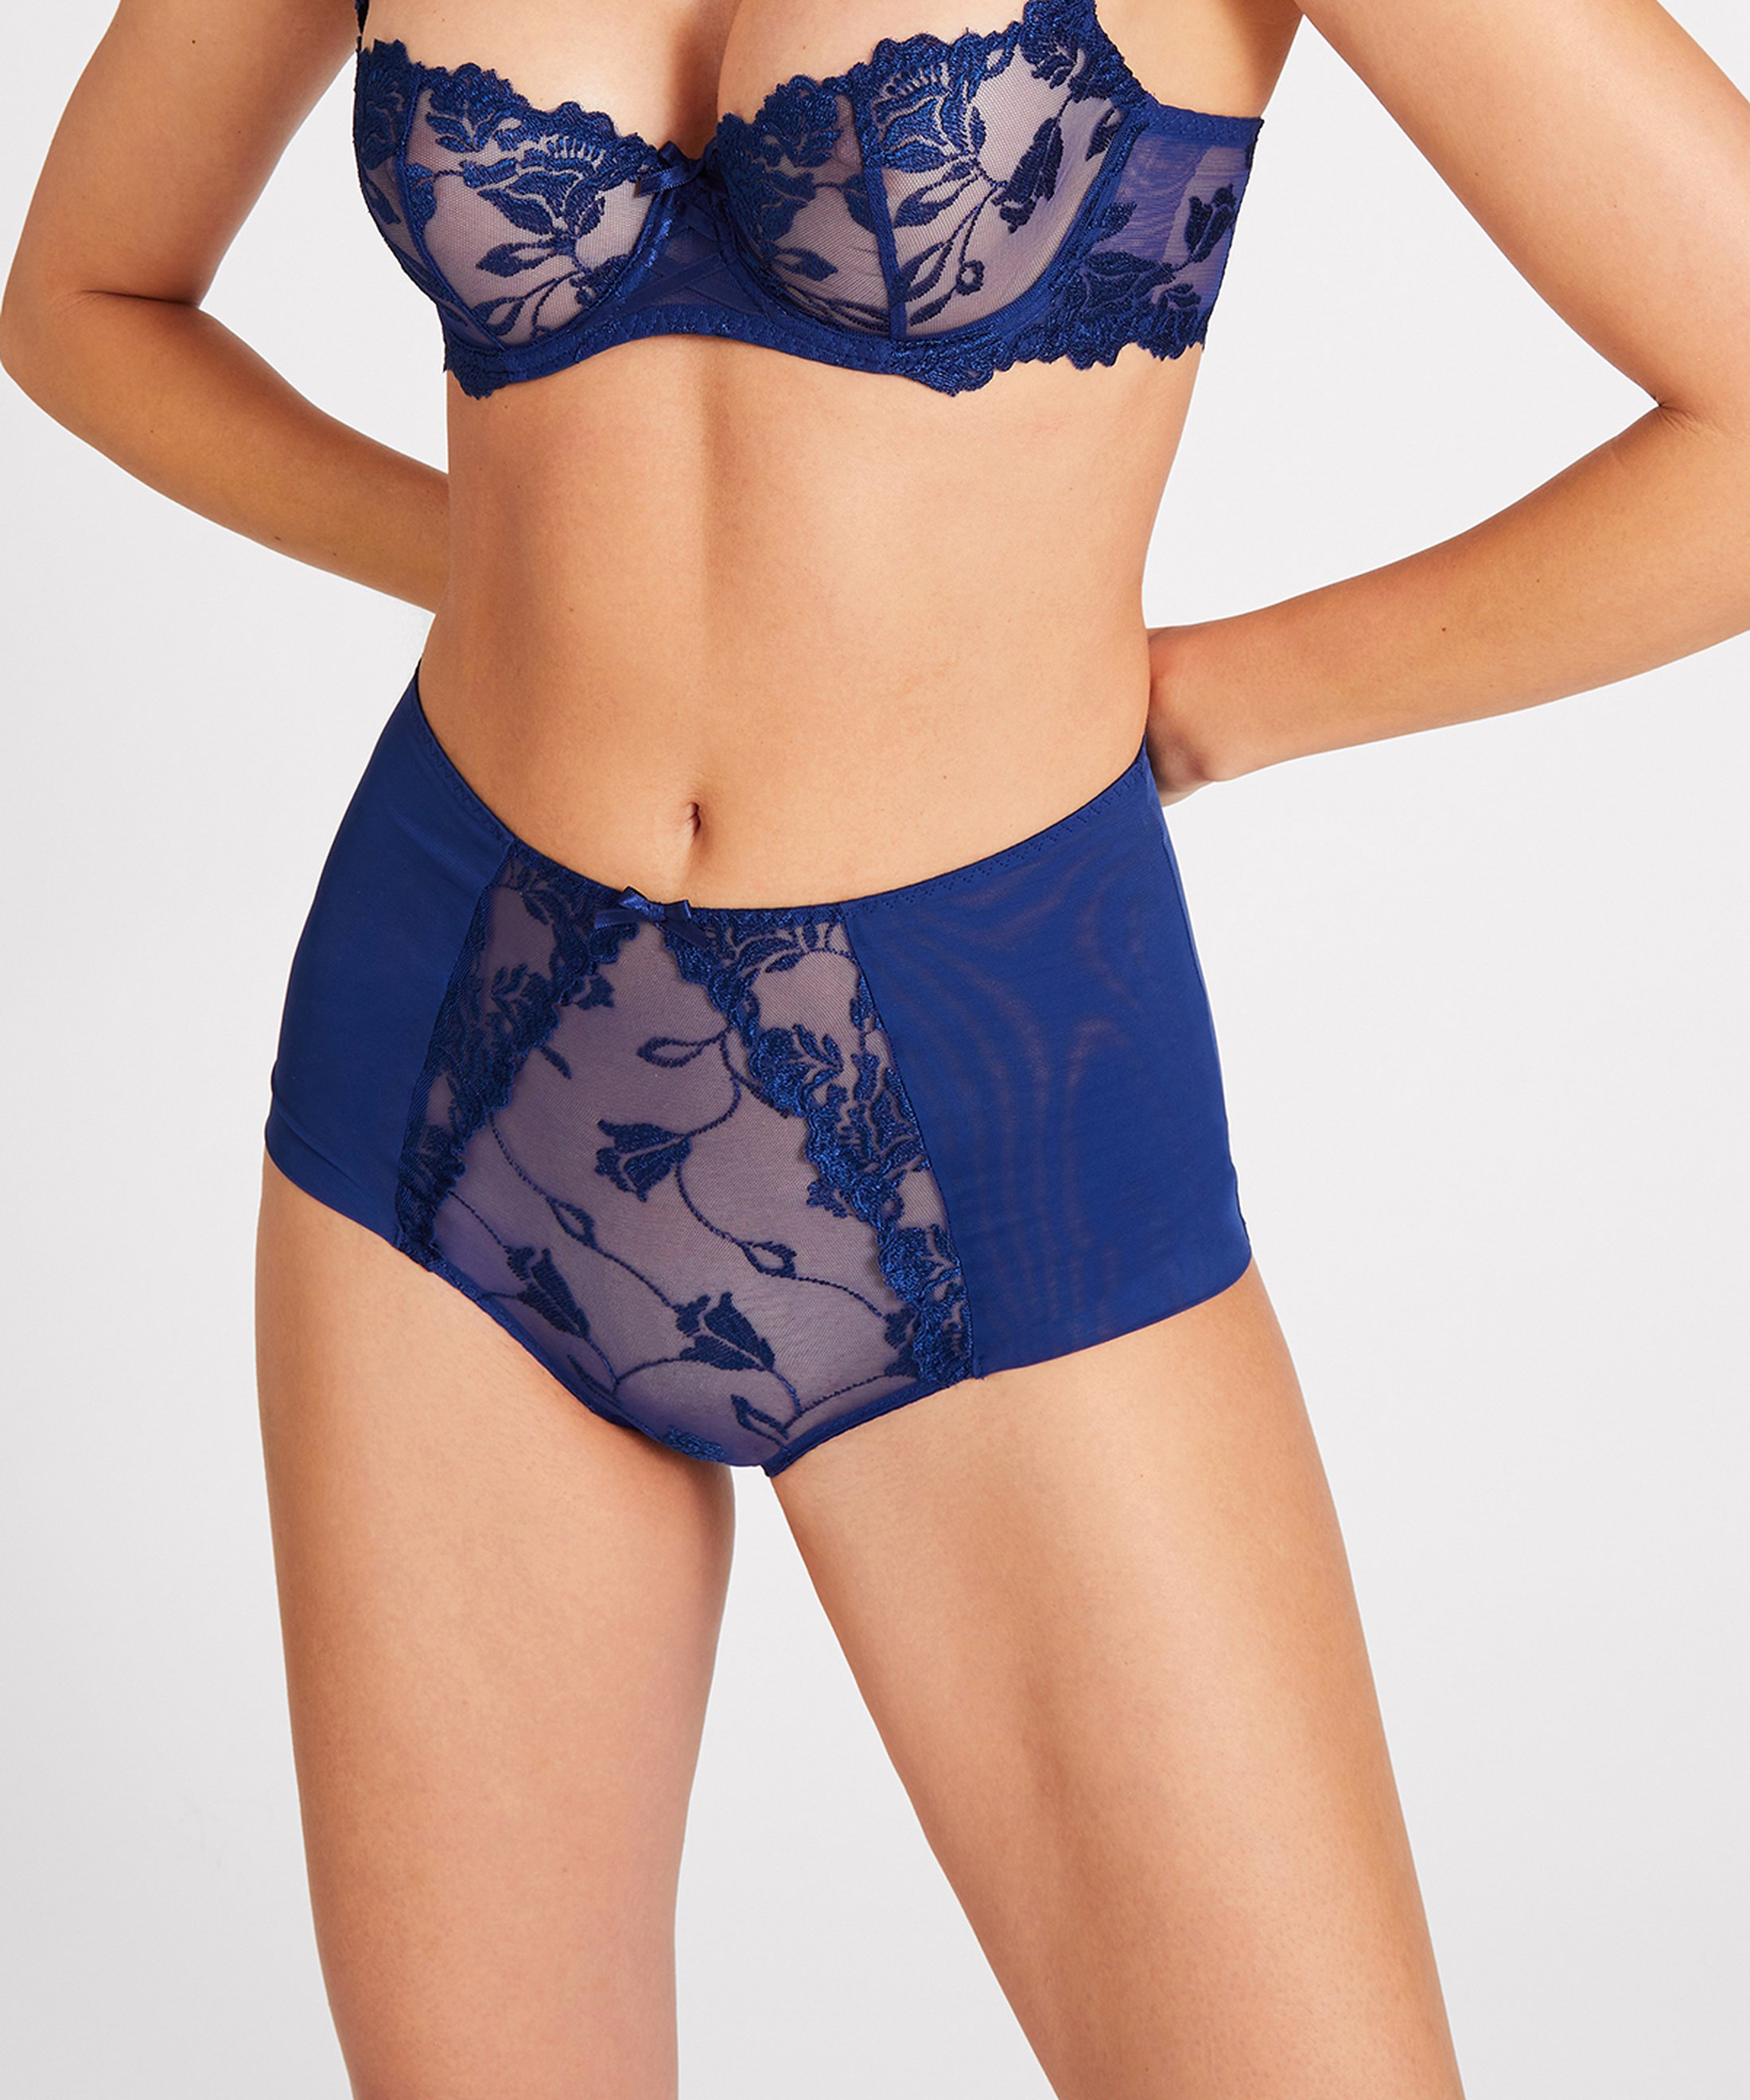 SOFTESSENCE Culotte taille haute Bleu Saphir | Aubade